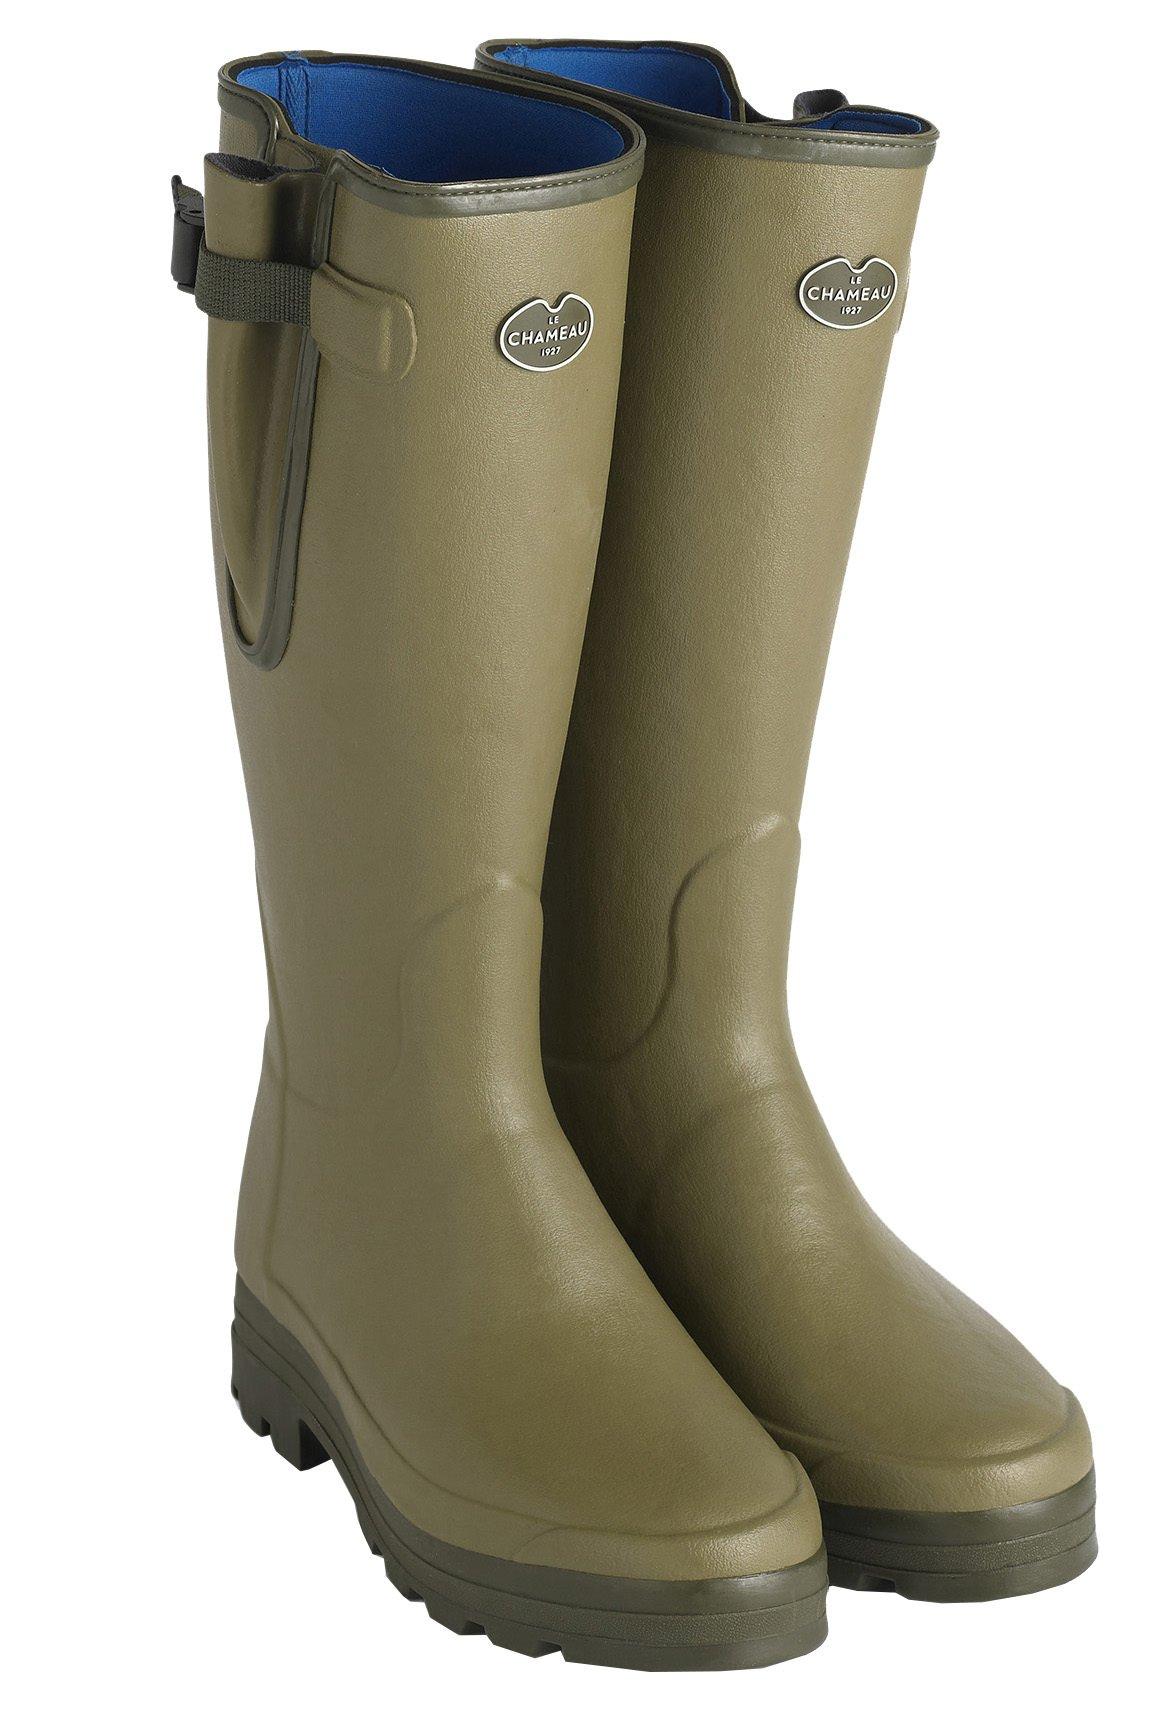 Le Chameau Men's Vierzonord Neoprene Lined Boots Vert Chameau Green - US 11 by LE CHAMEAU 1927